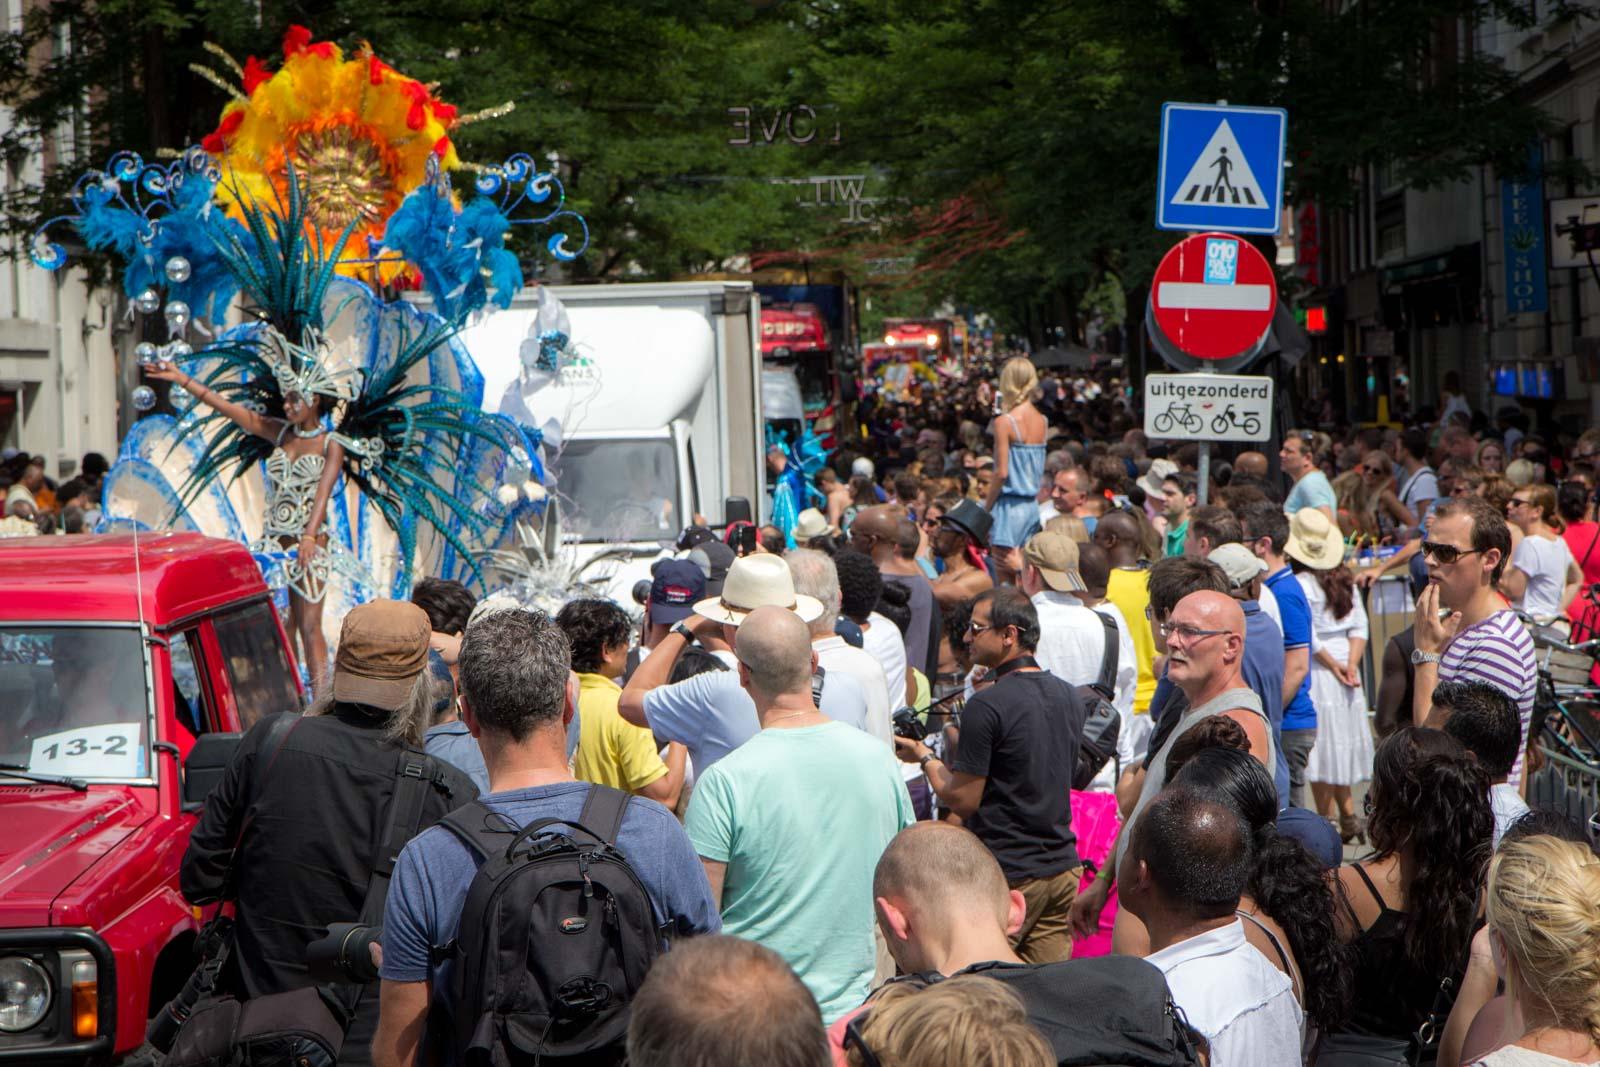 Rotterdam Unlimited festival photos, Netherlands